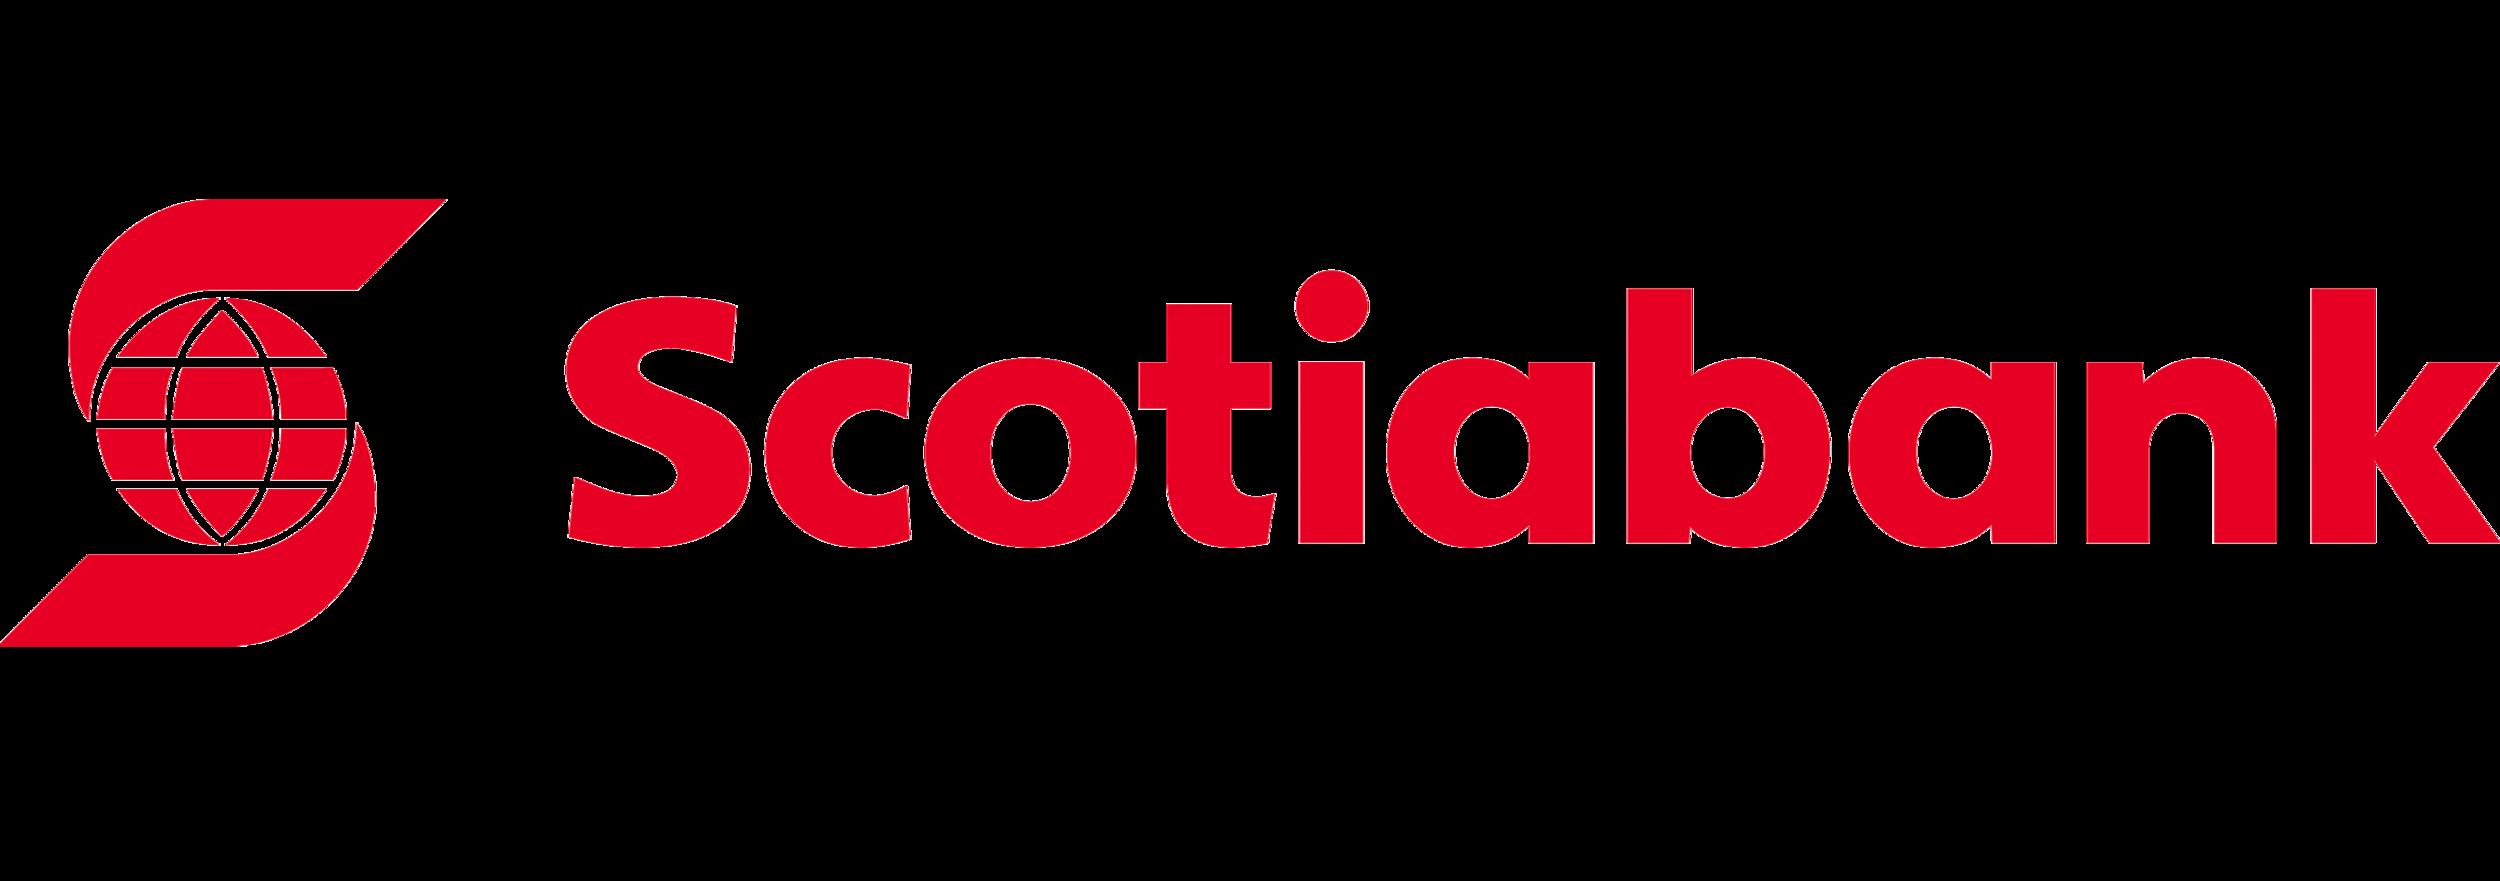 Scotiabank-Logo-PNG-03791-1.png